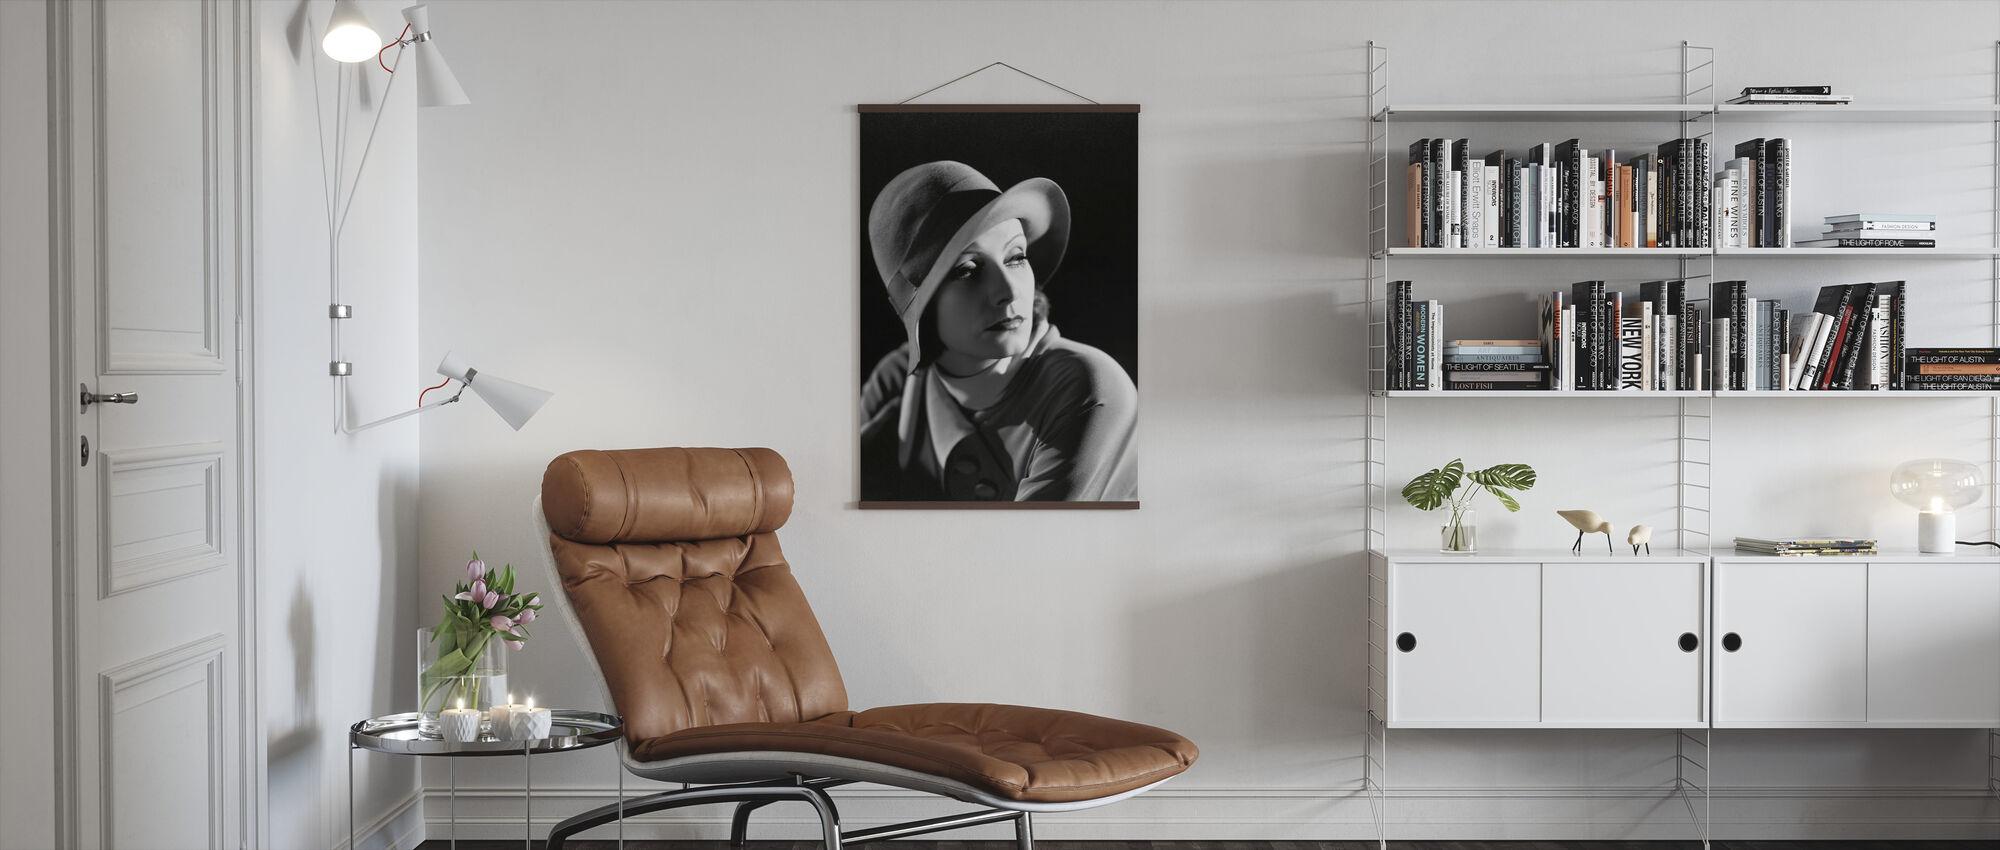 Greta Garbo i Inspiration - Poster - Vardagsrum